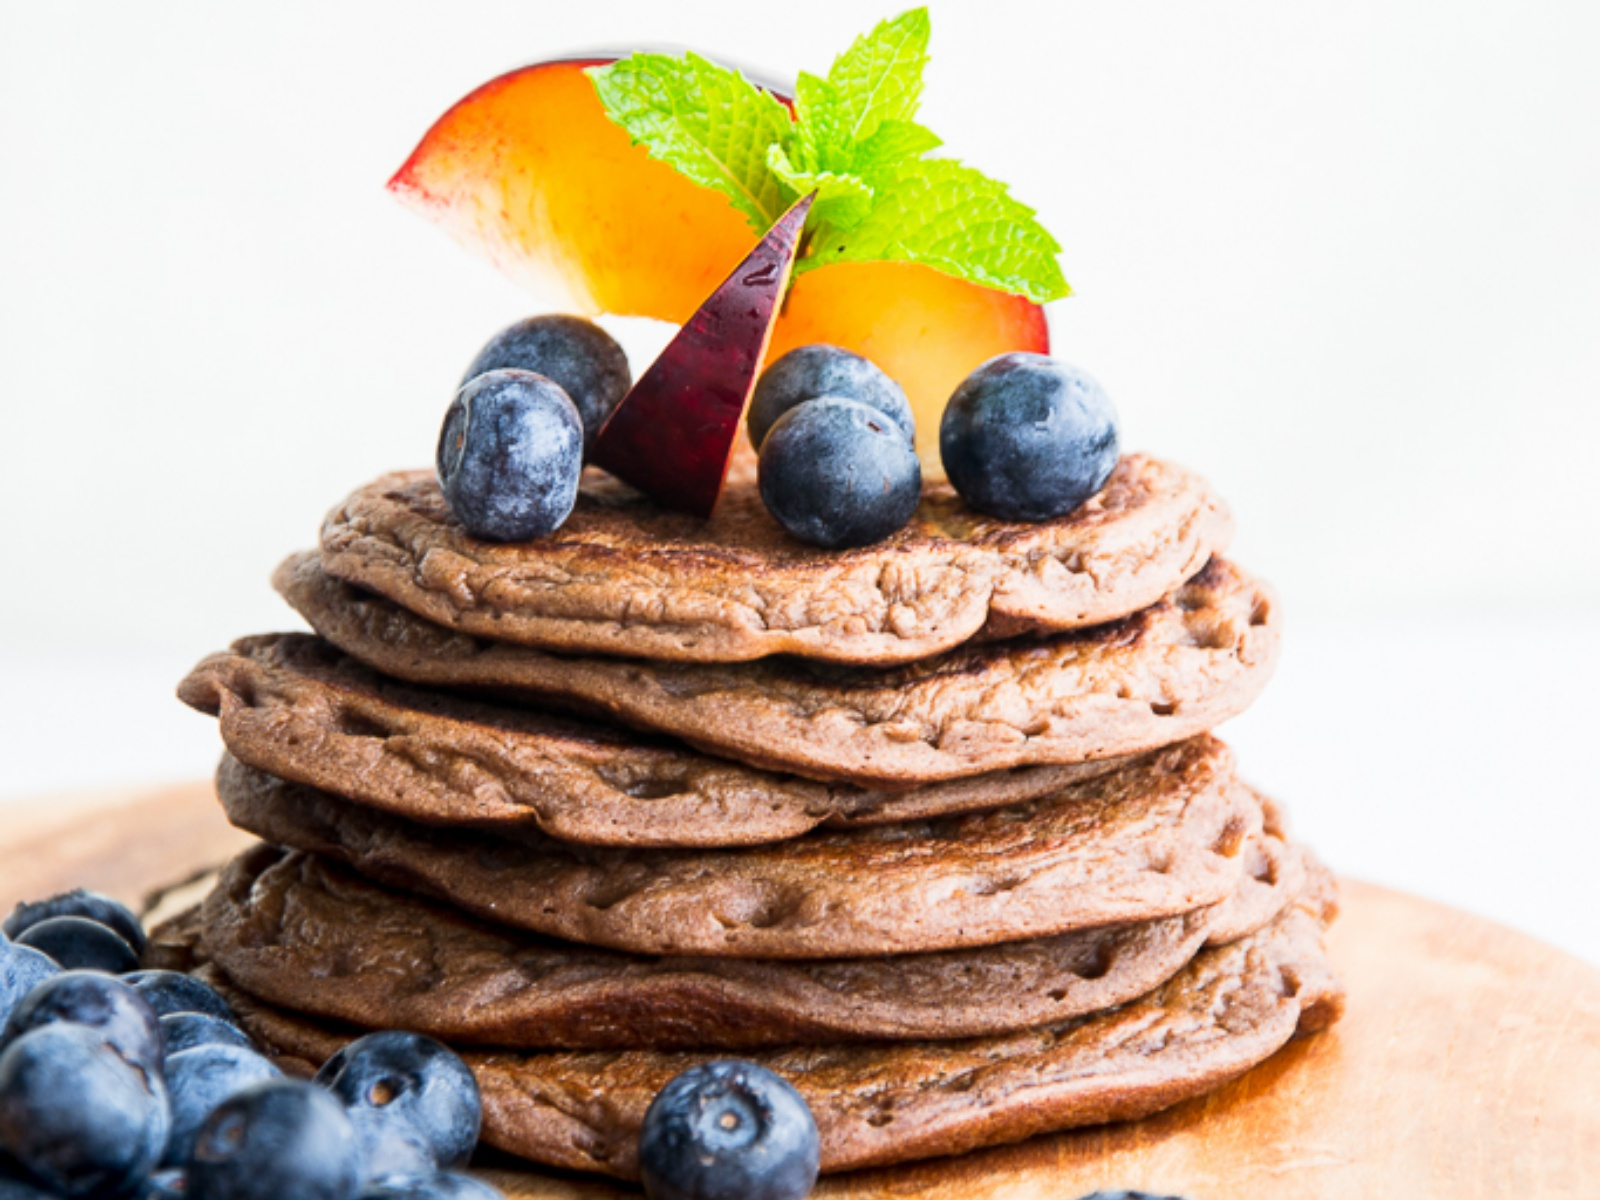 Vegan Chocolate Banana Pancakes